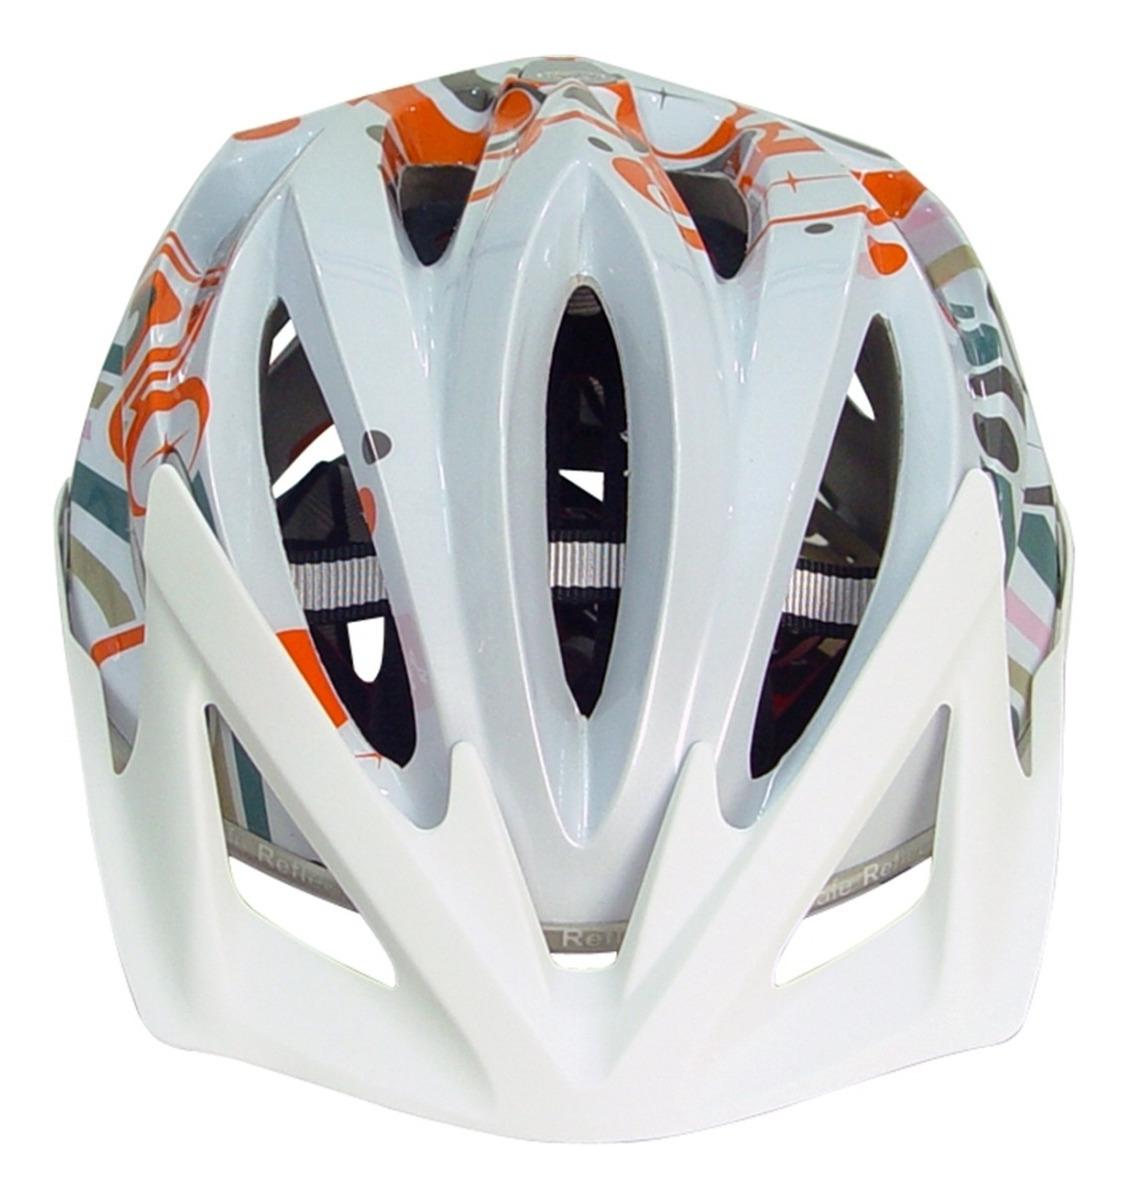 Capacete Ciclismo Mtb Prowell F44 Raden M/ L (56-62cm)